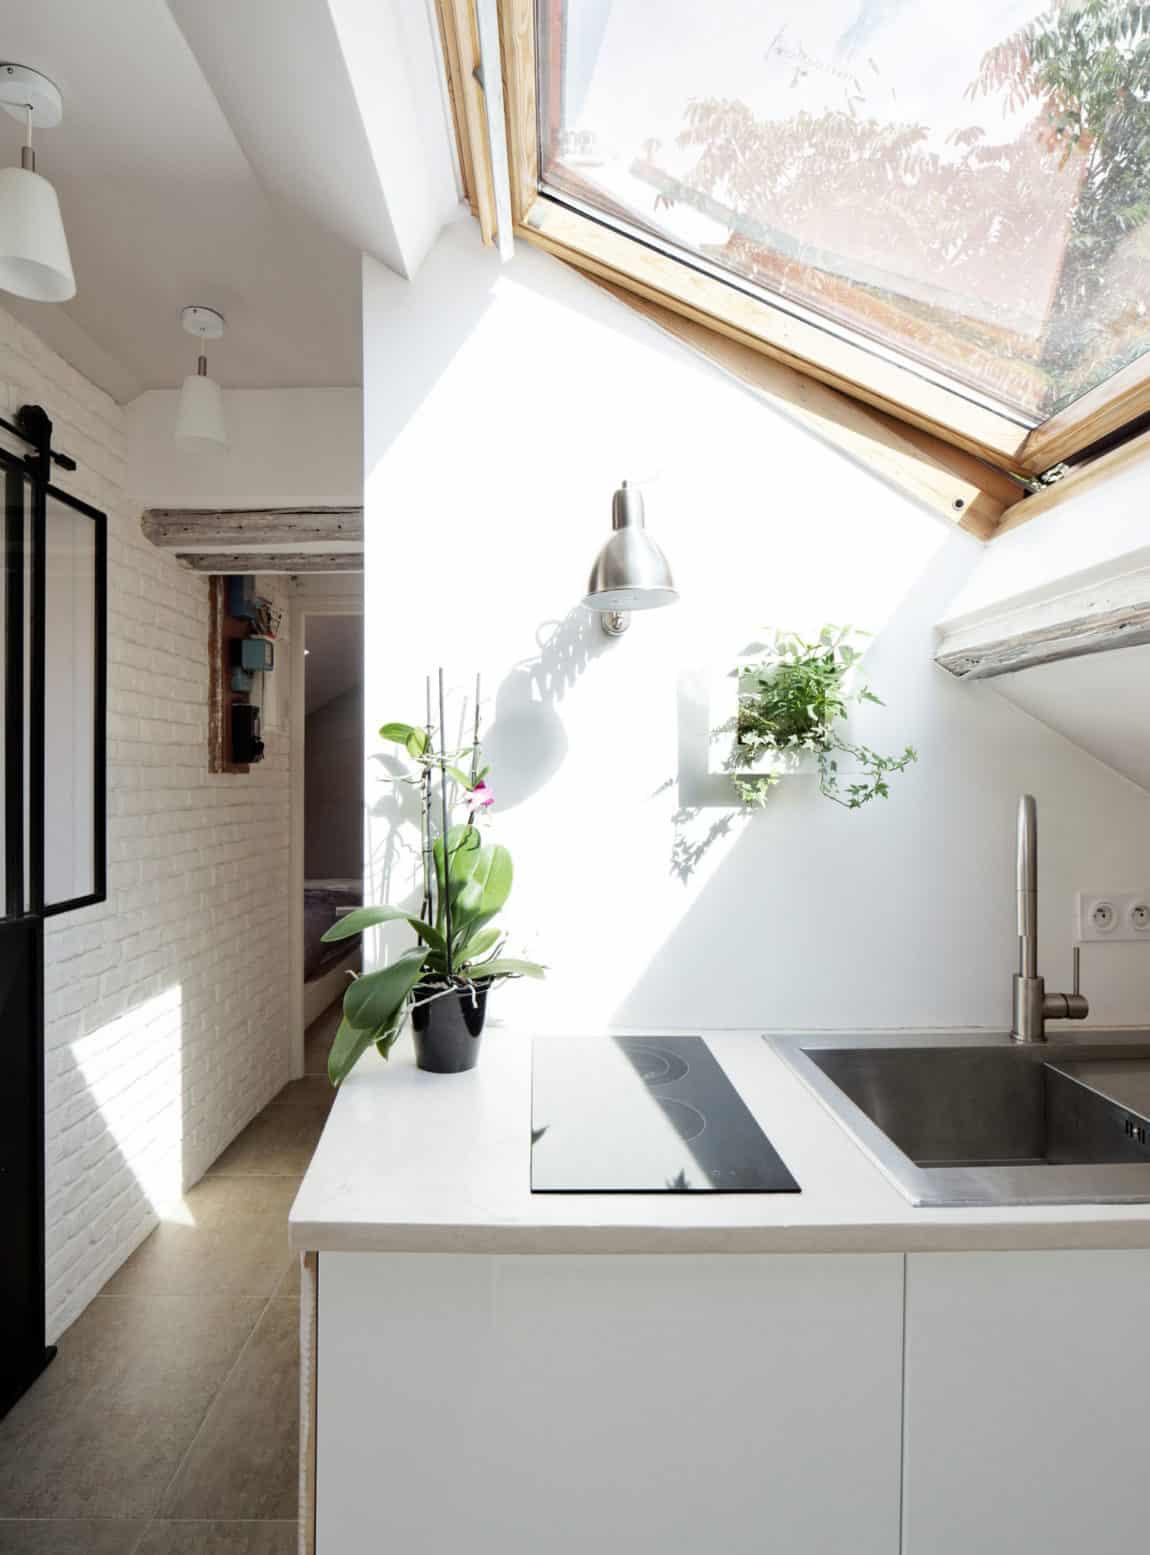 Habiter sous les toits by Prisca Pellerin (6)